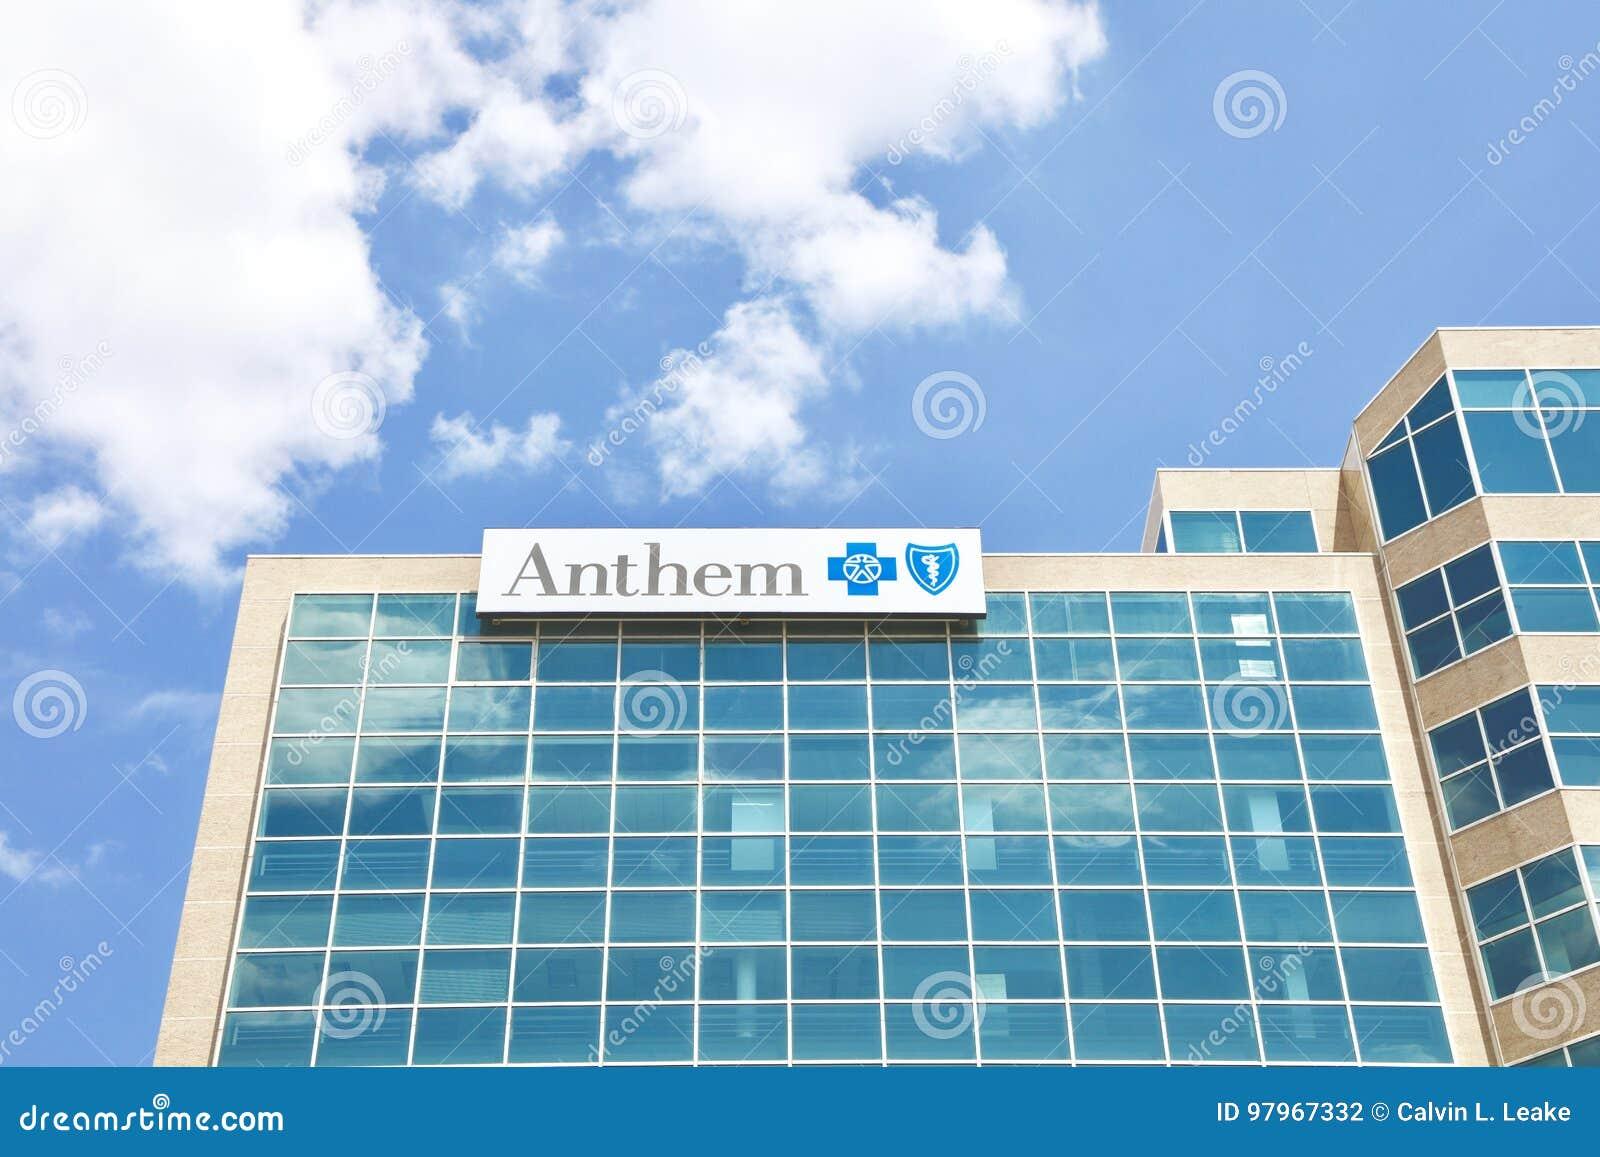 Anthem Health Insurance Company Redaktionelles ...